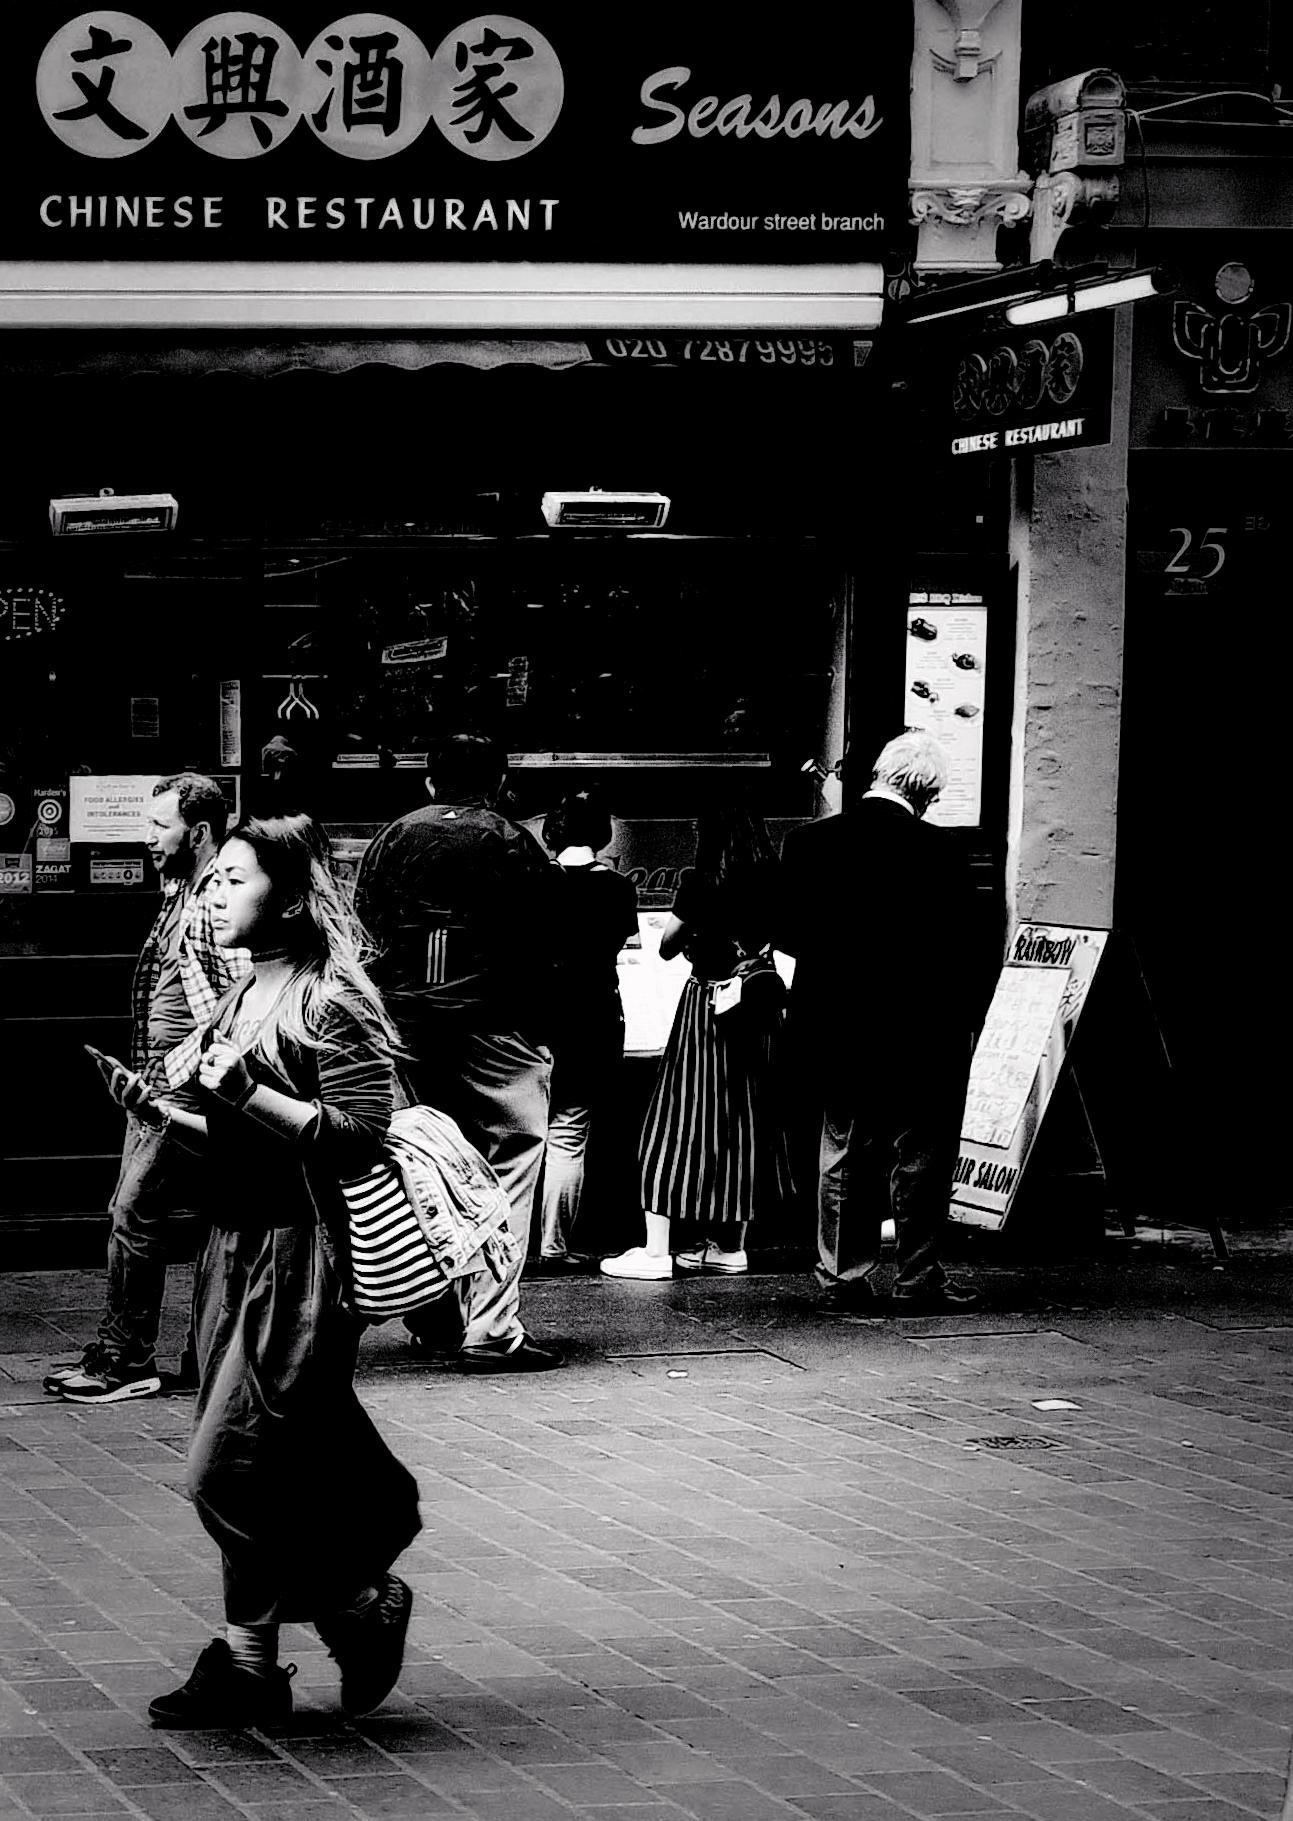 Chinatown, London, September 2016